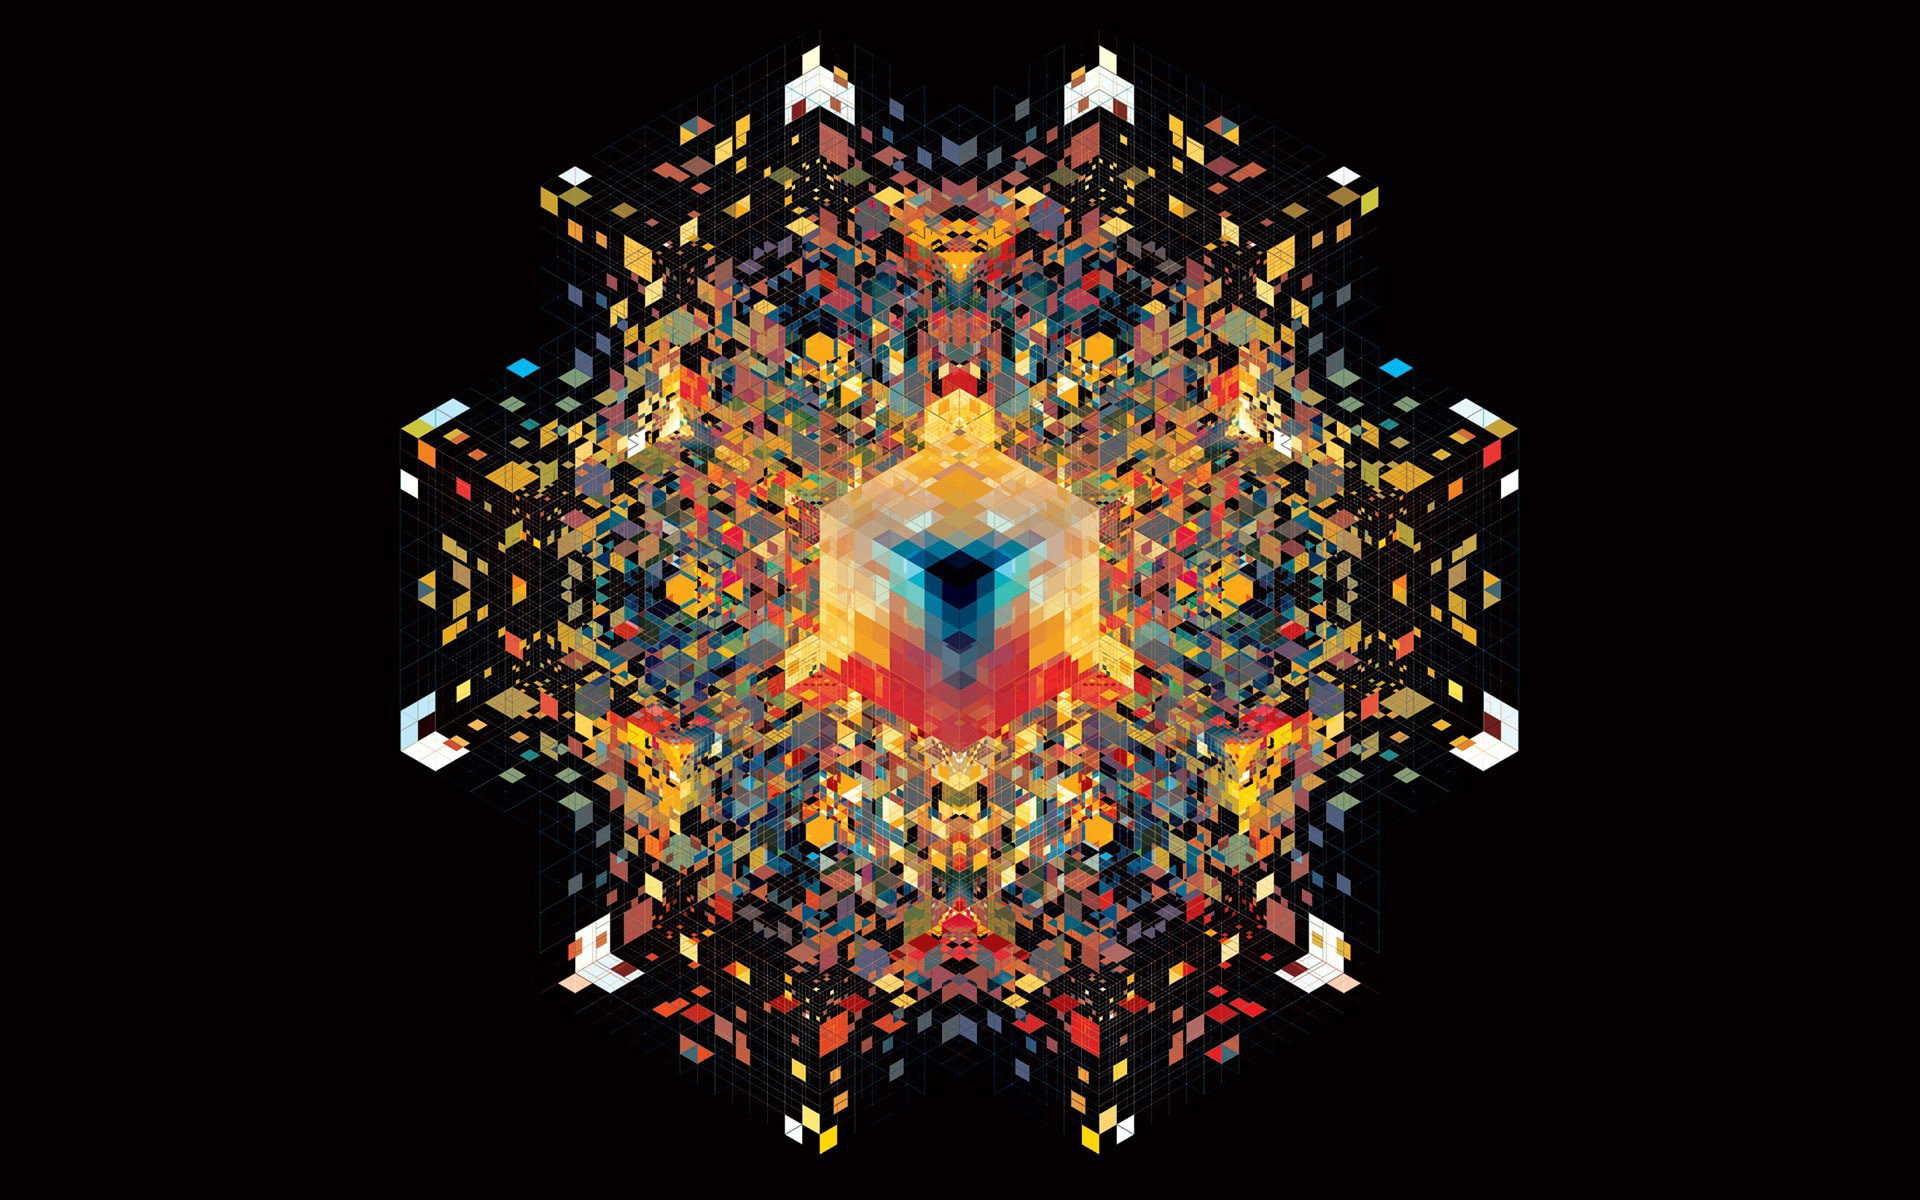 Best wallpaper hd 1080p free download 1366×768 | sacred geometry